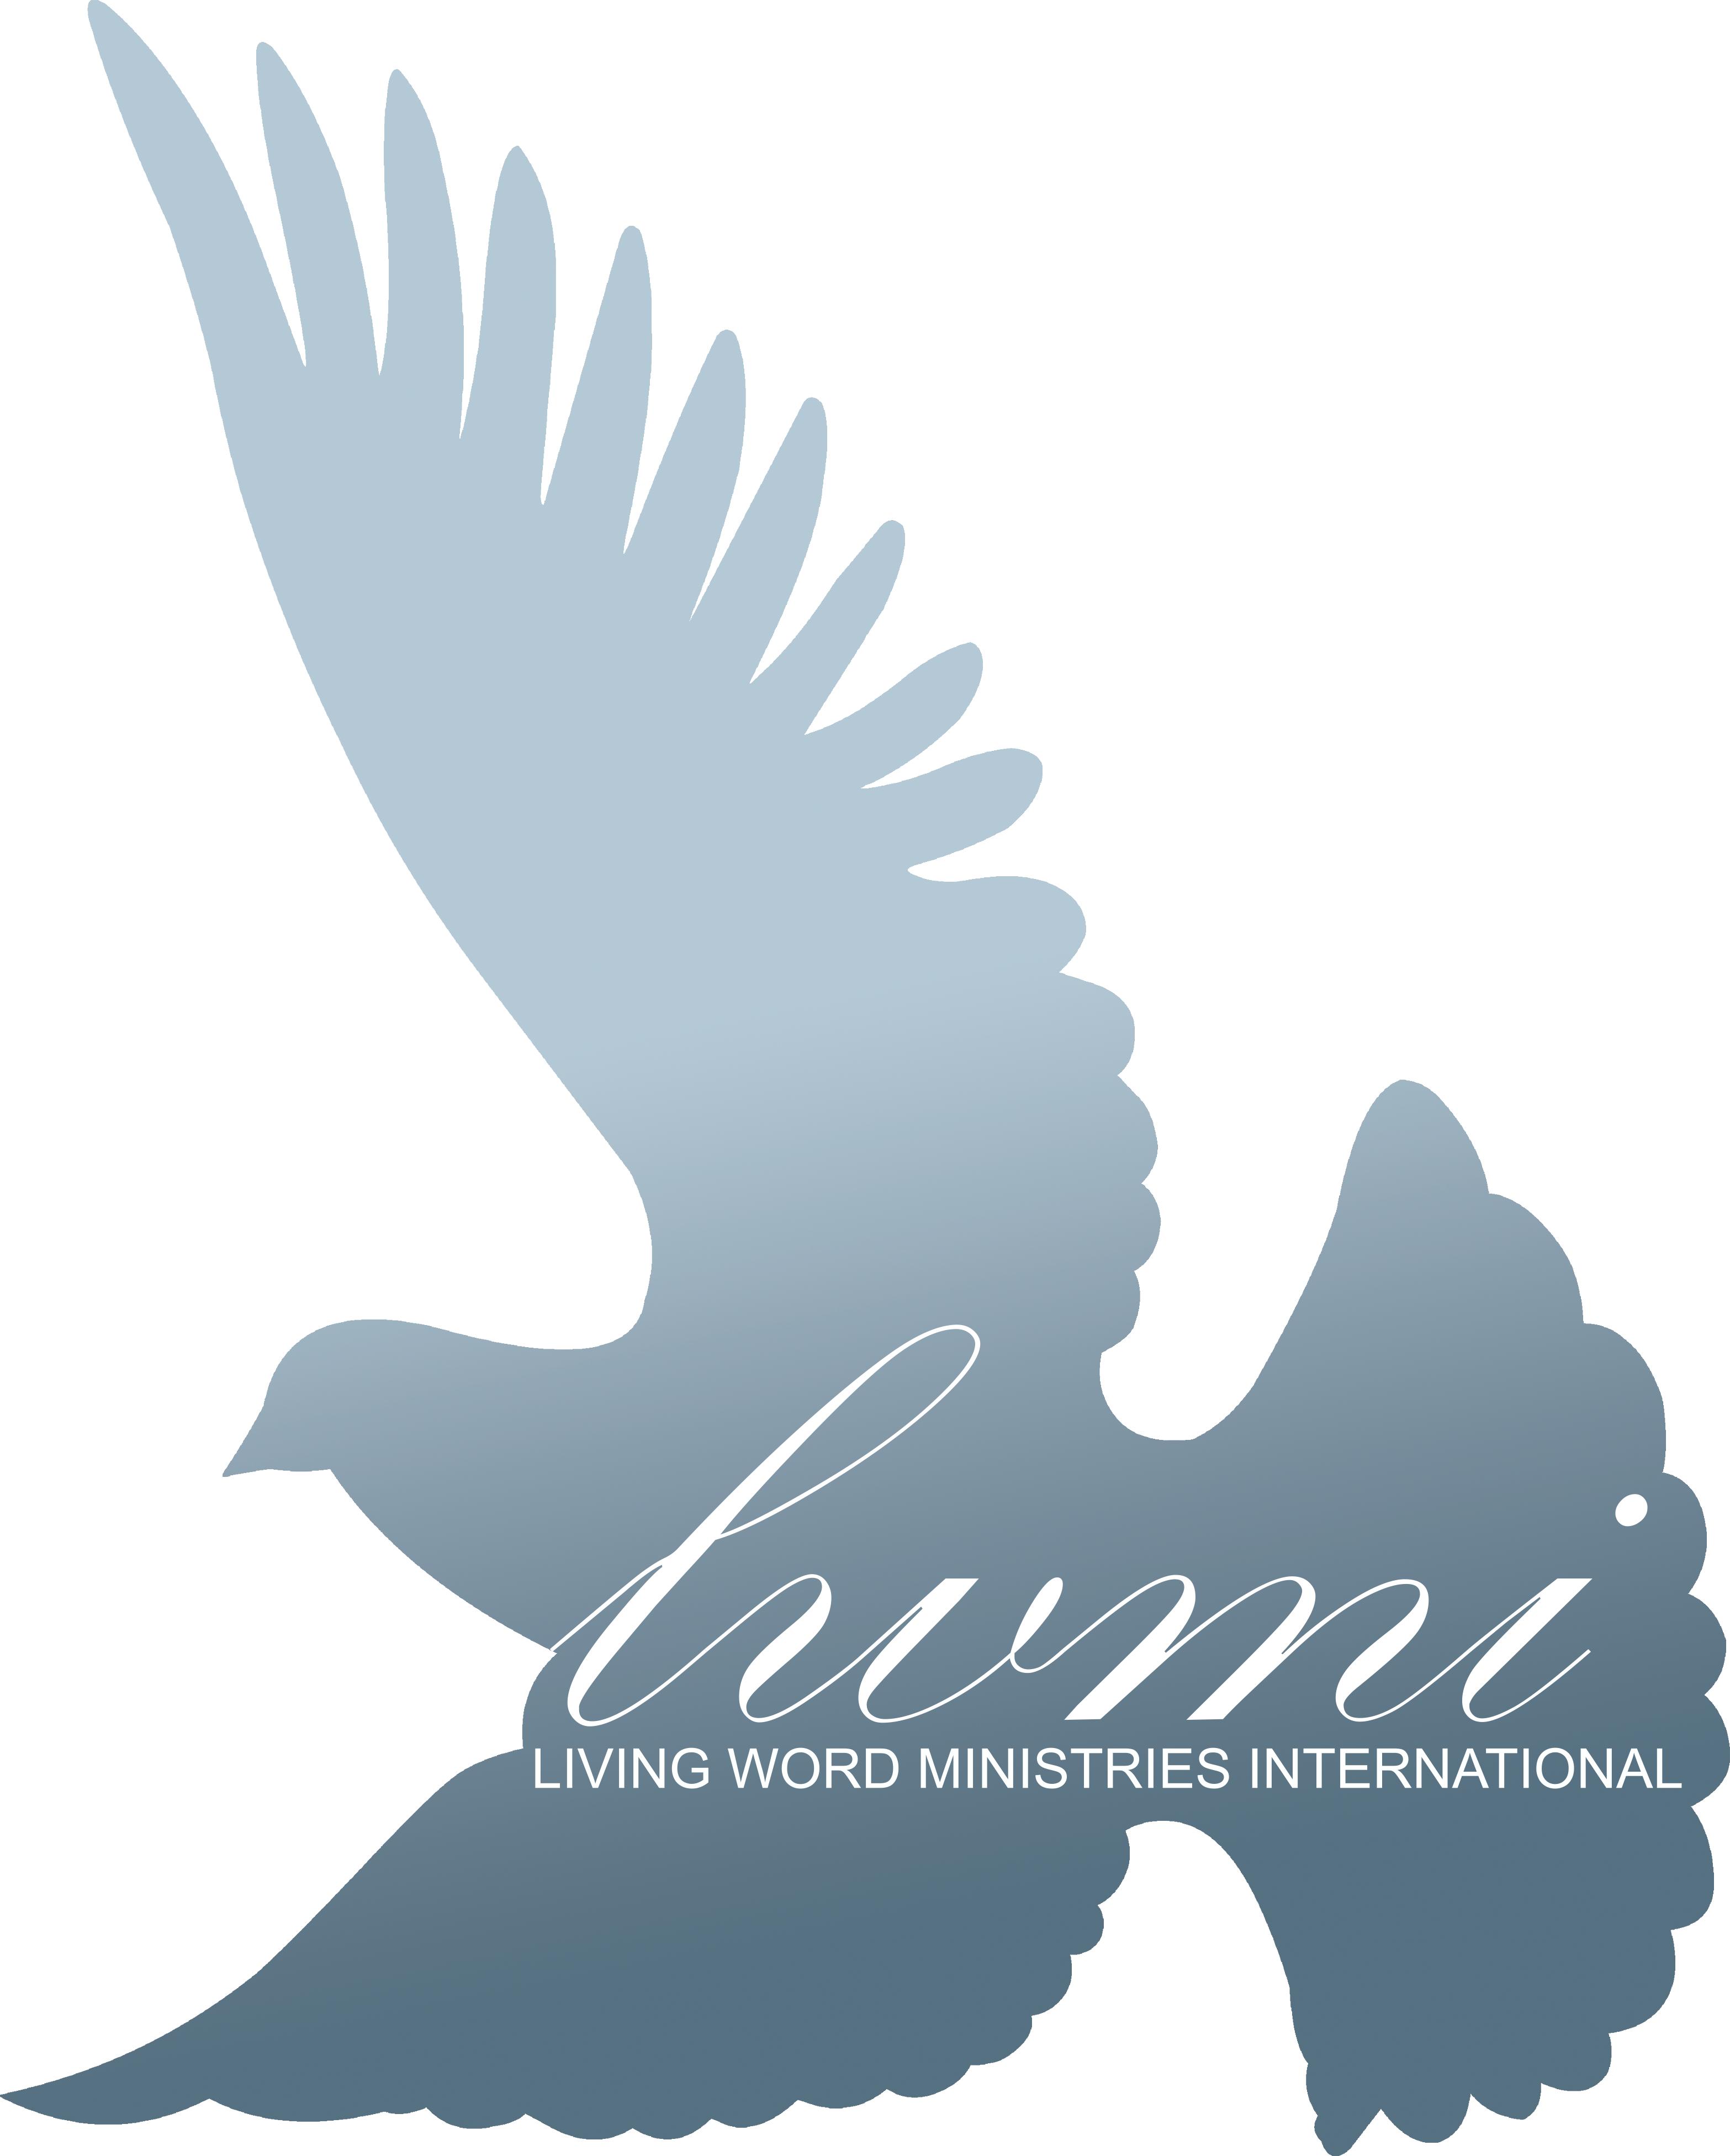 Living Word Ministries International